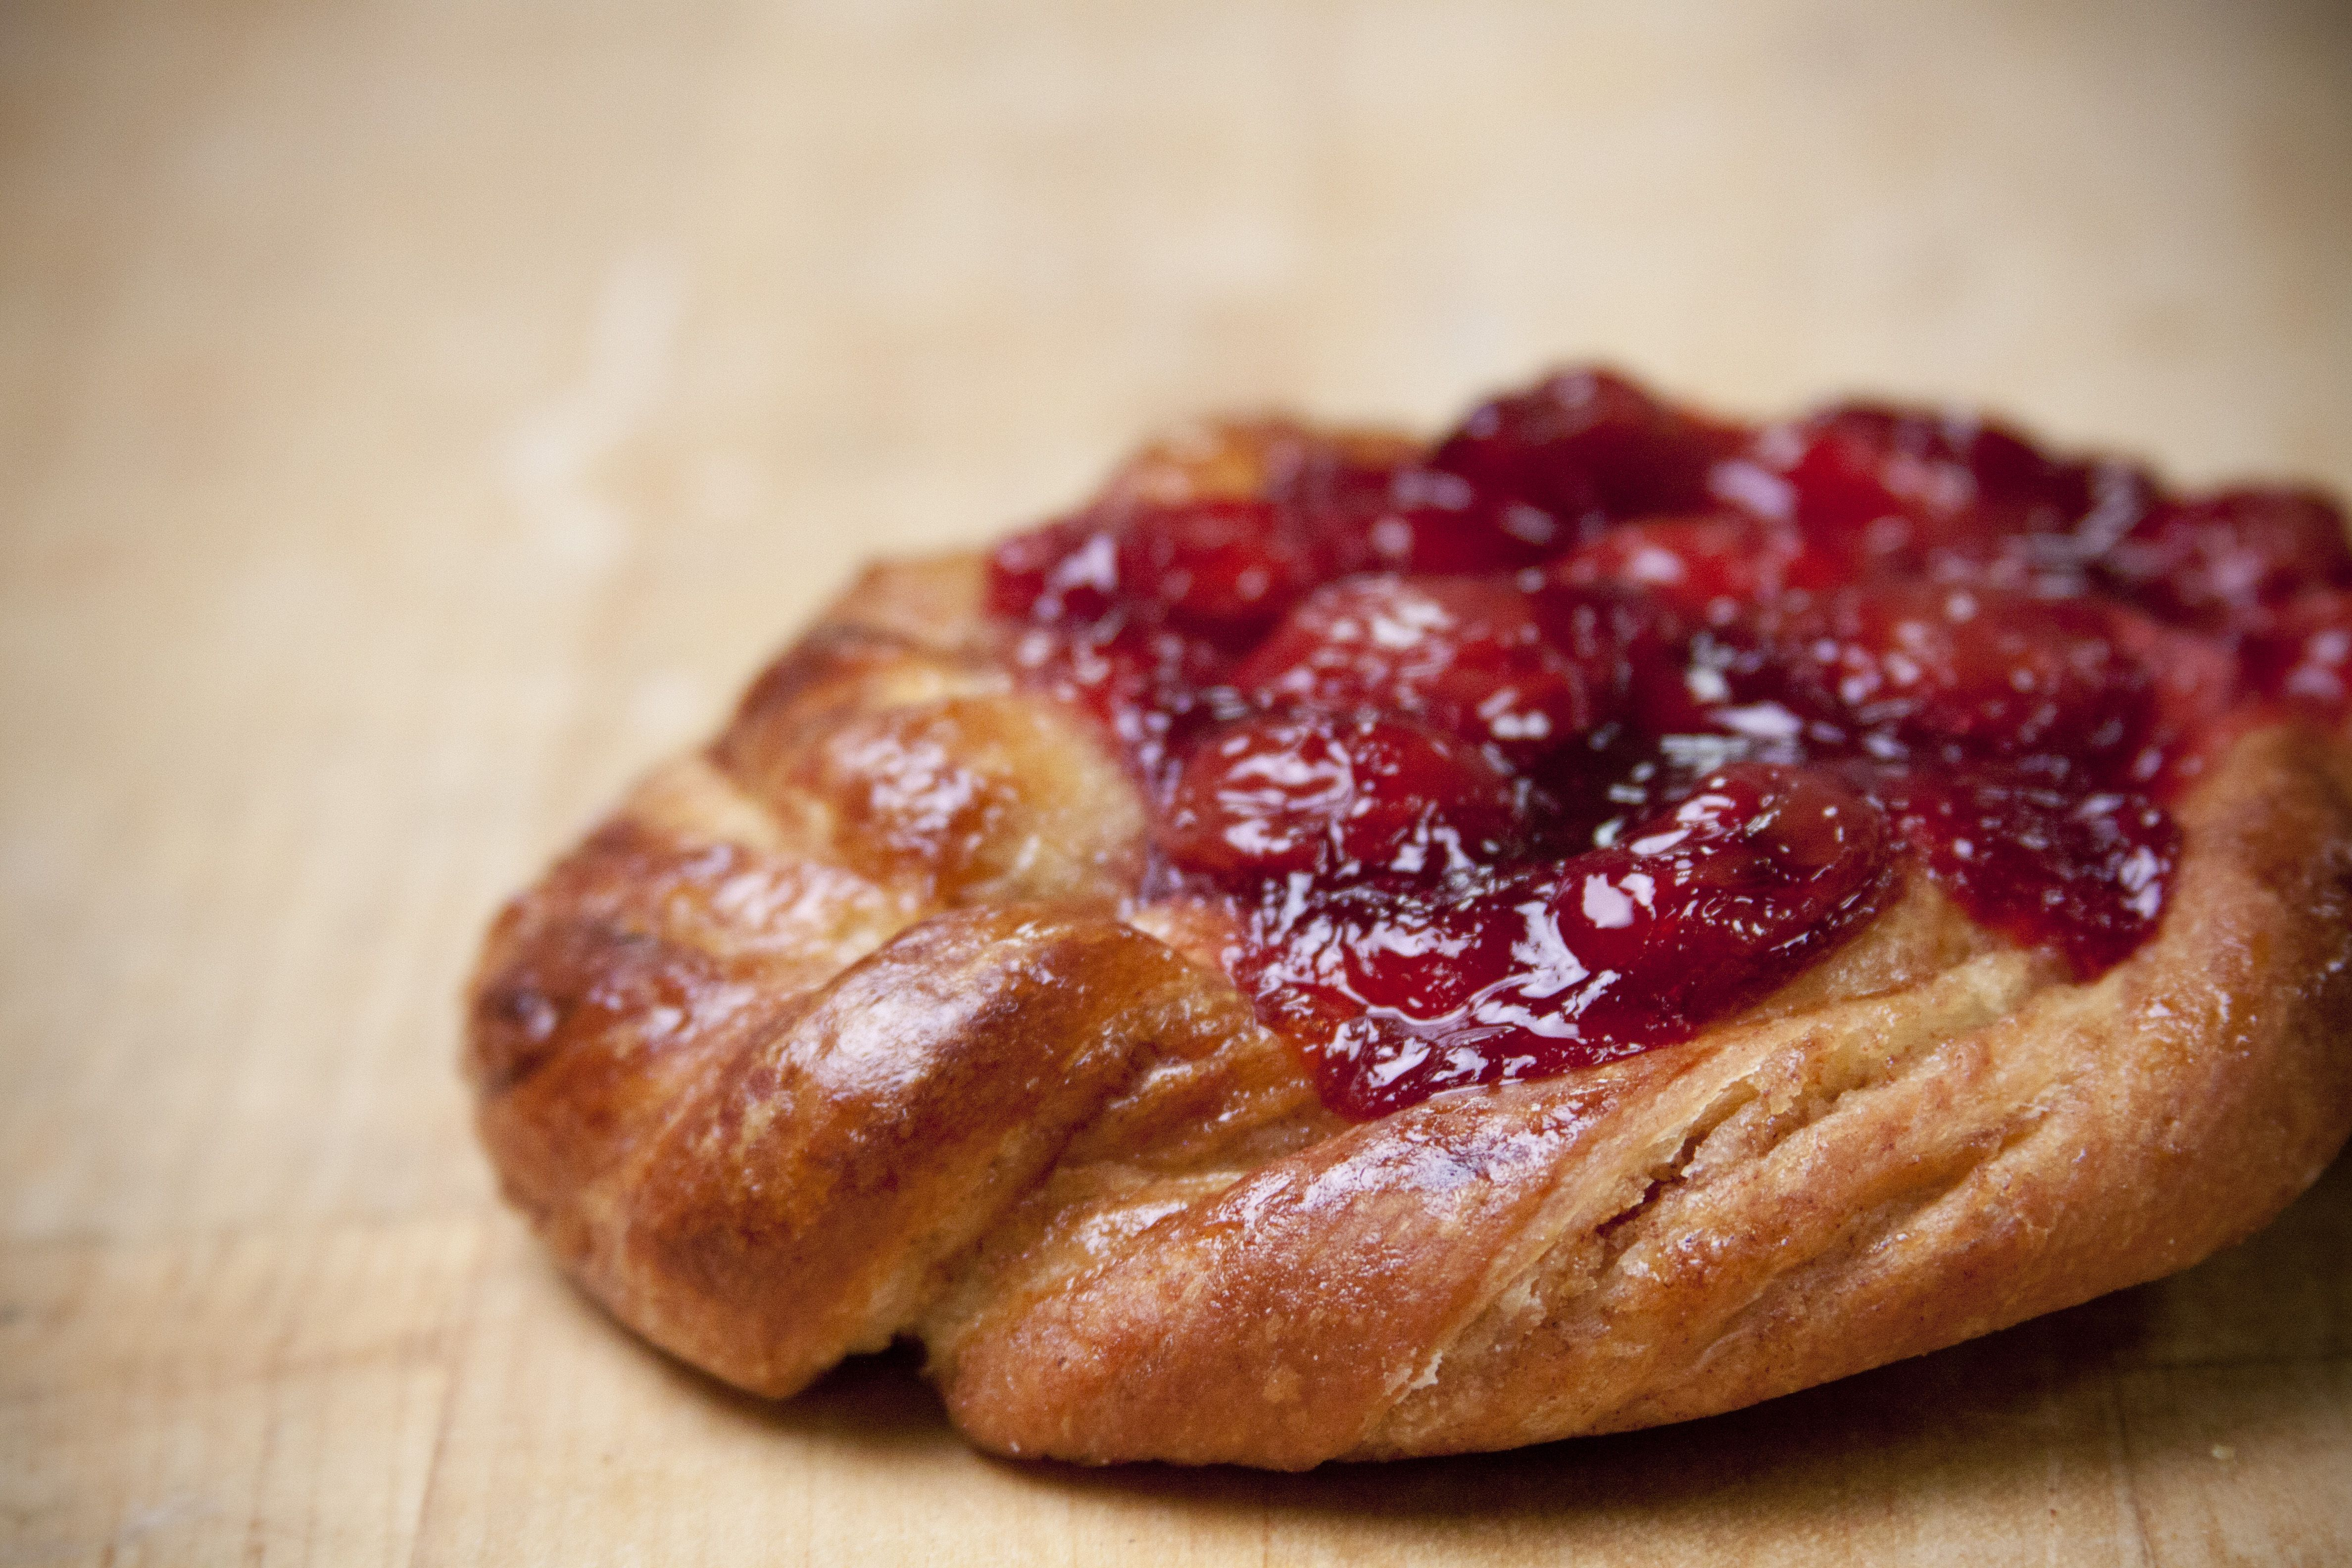 Danish with cherries? Yes, please!